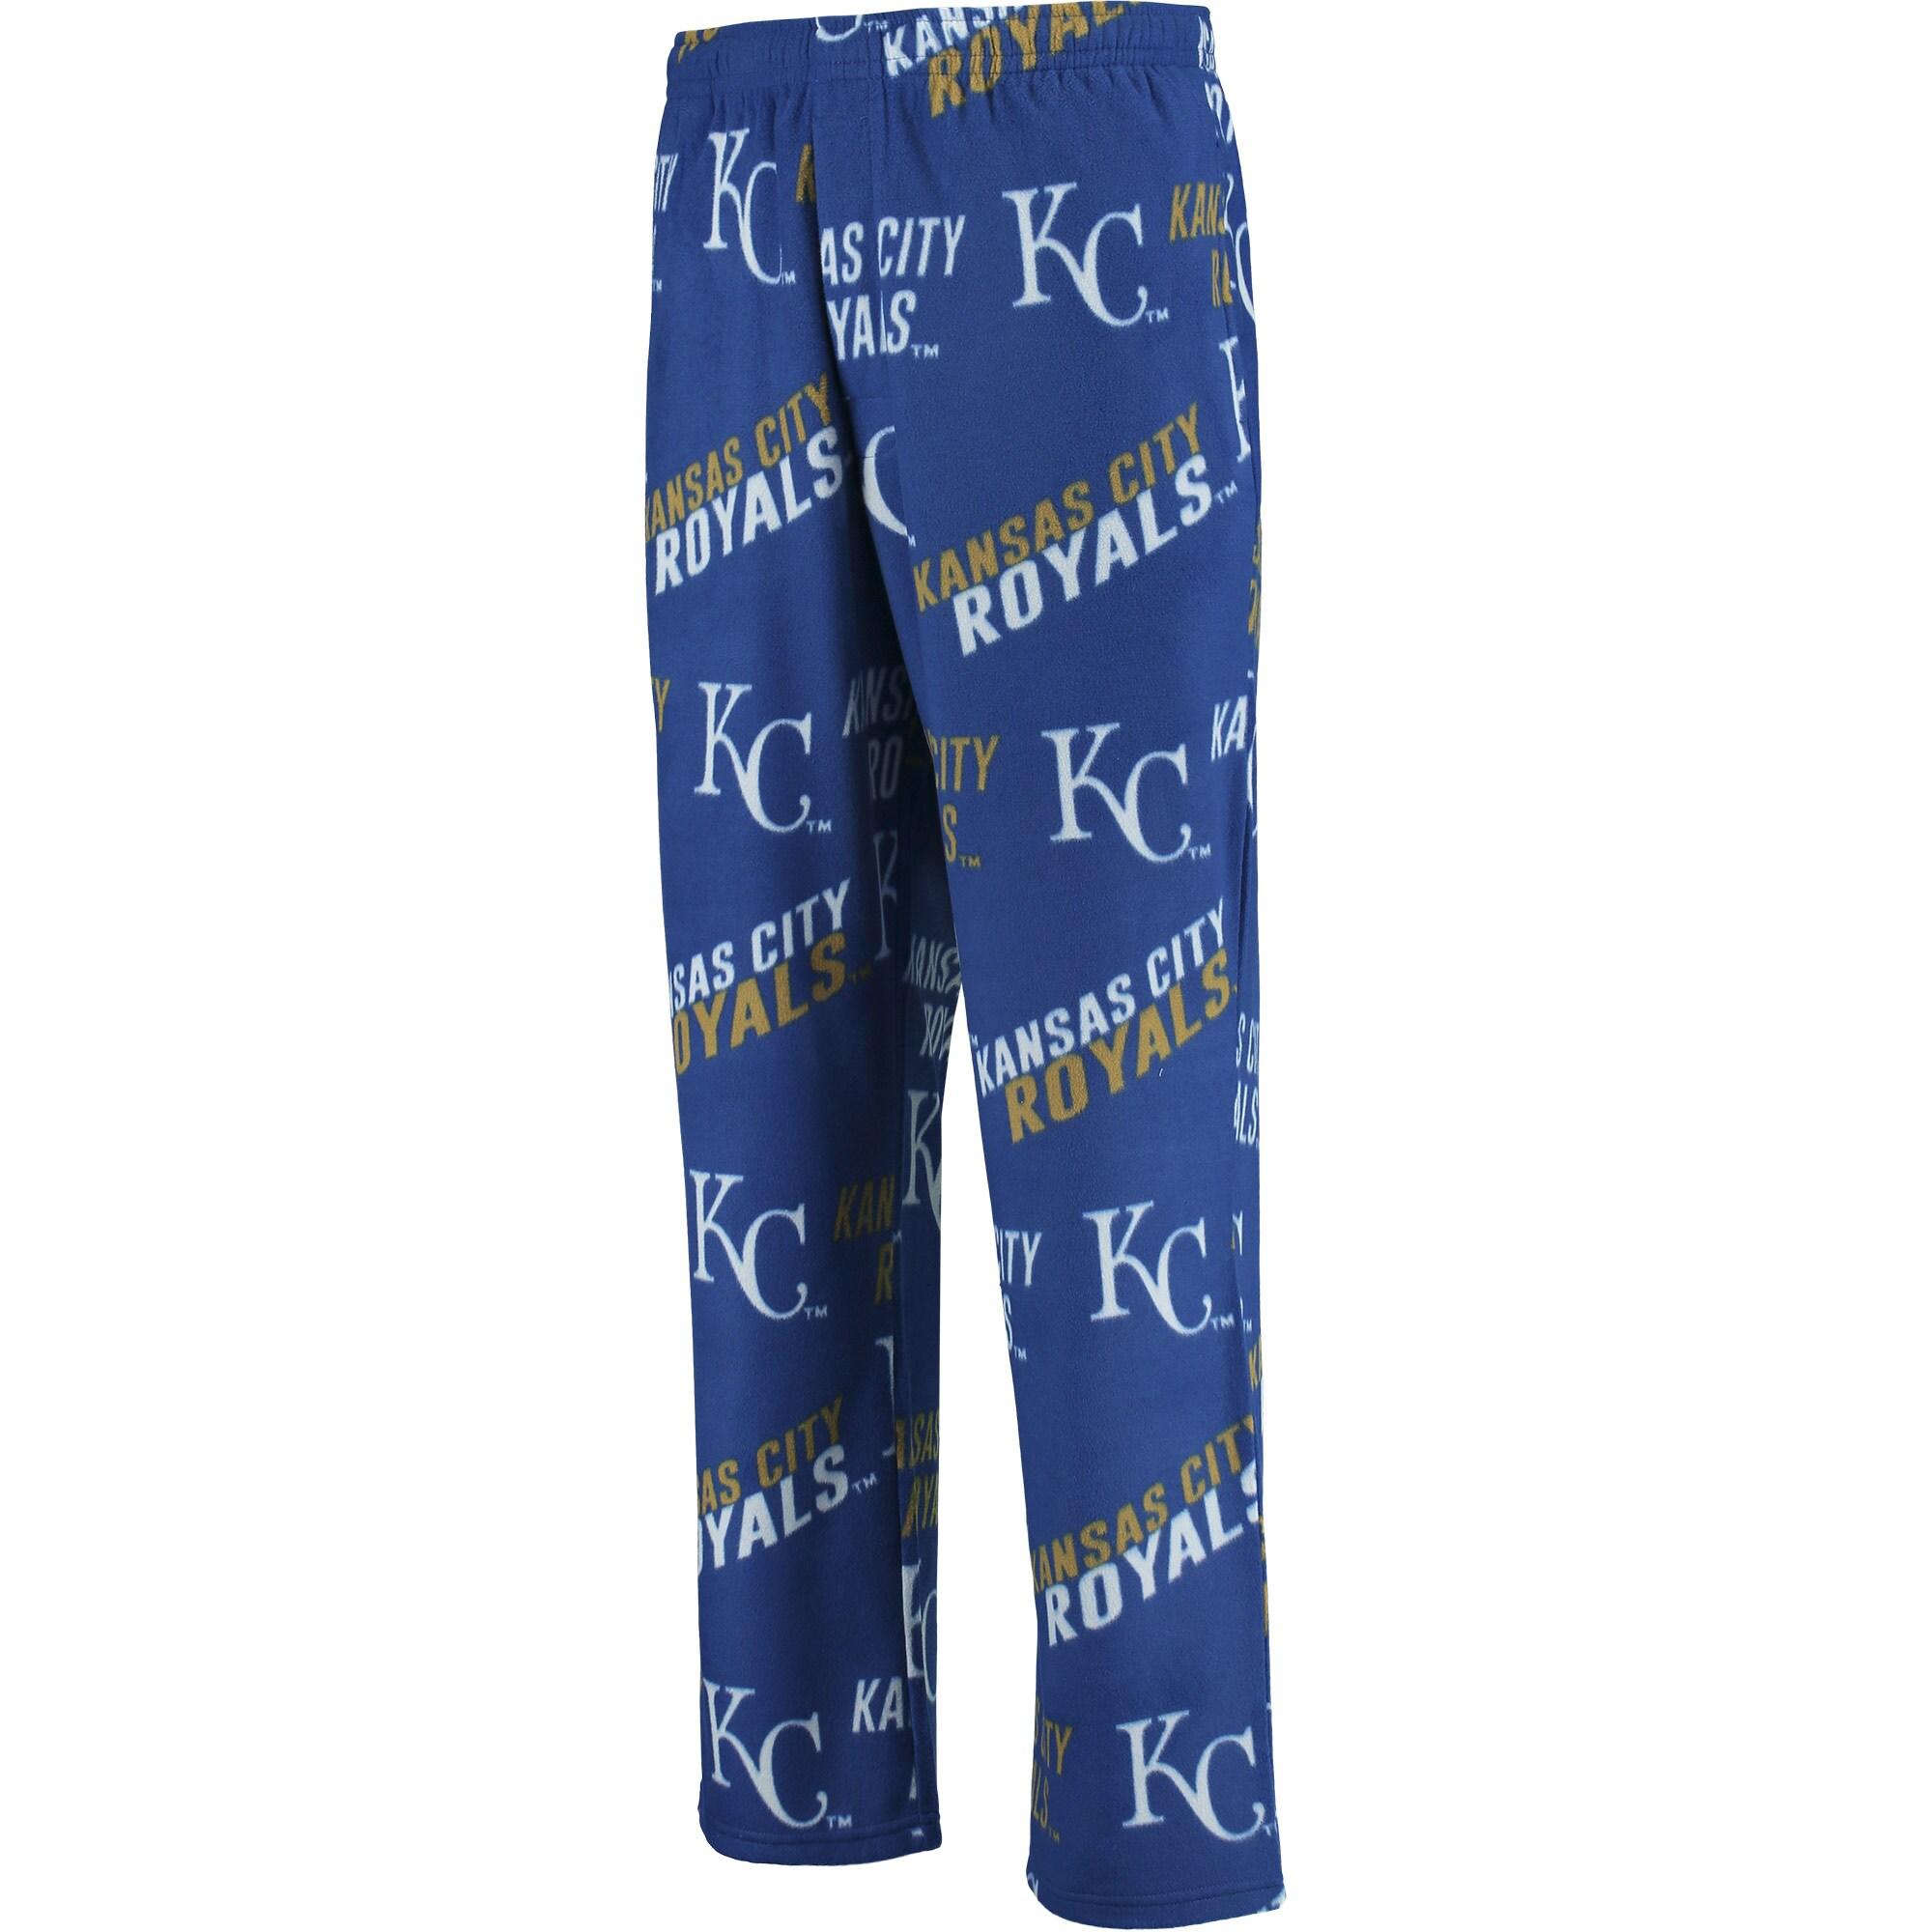 Kansas City Royals Concepts Sport Wild Card Fleece Lounge Pants - Royal